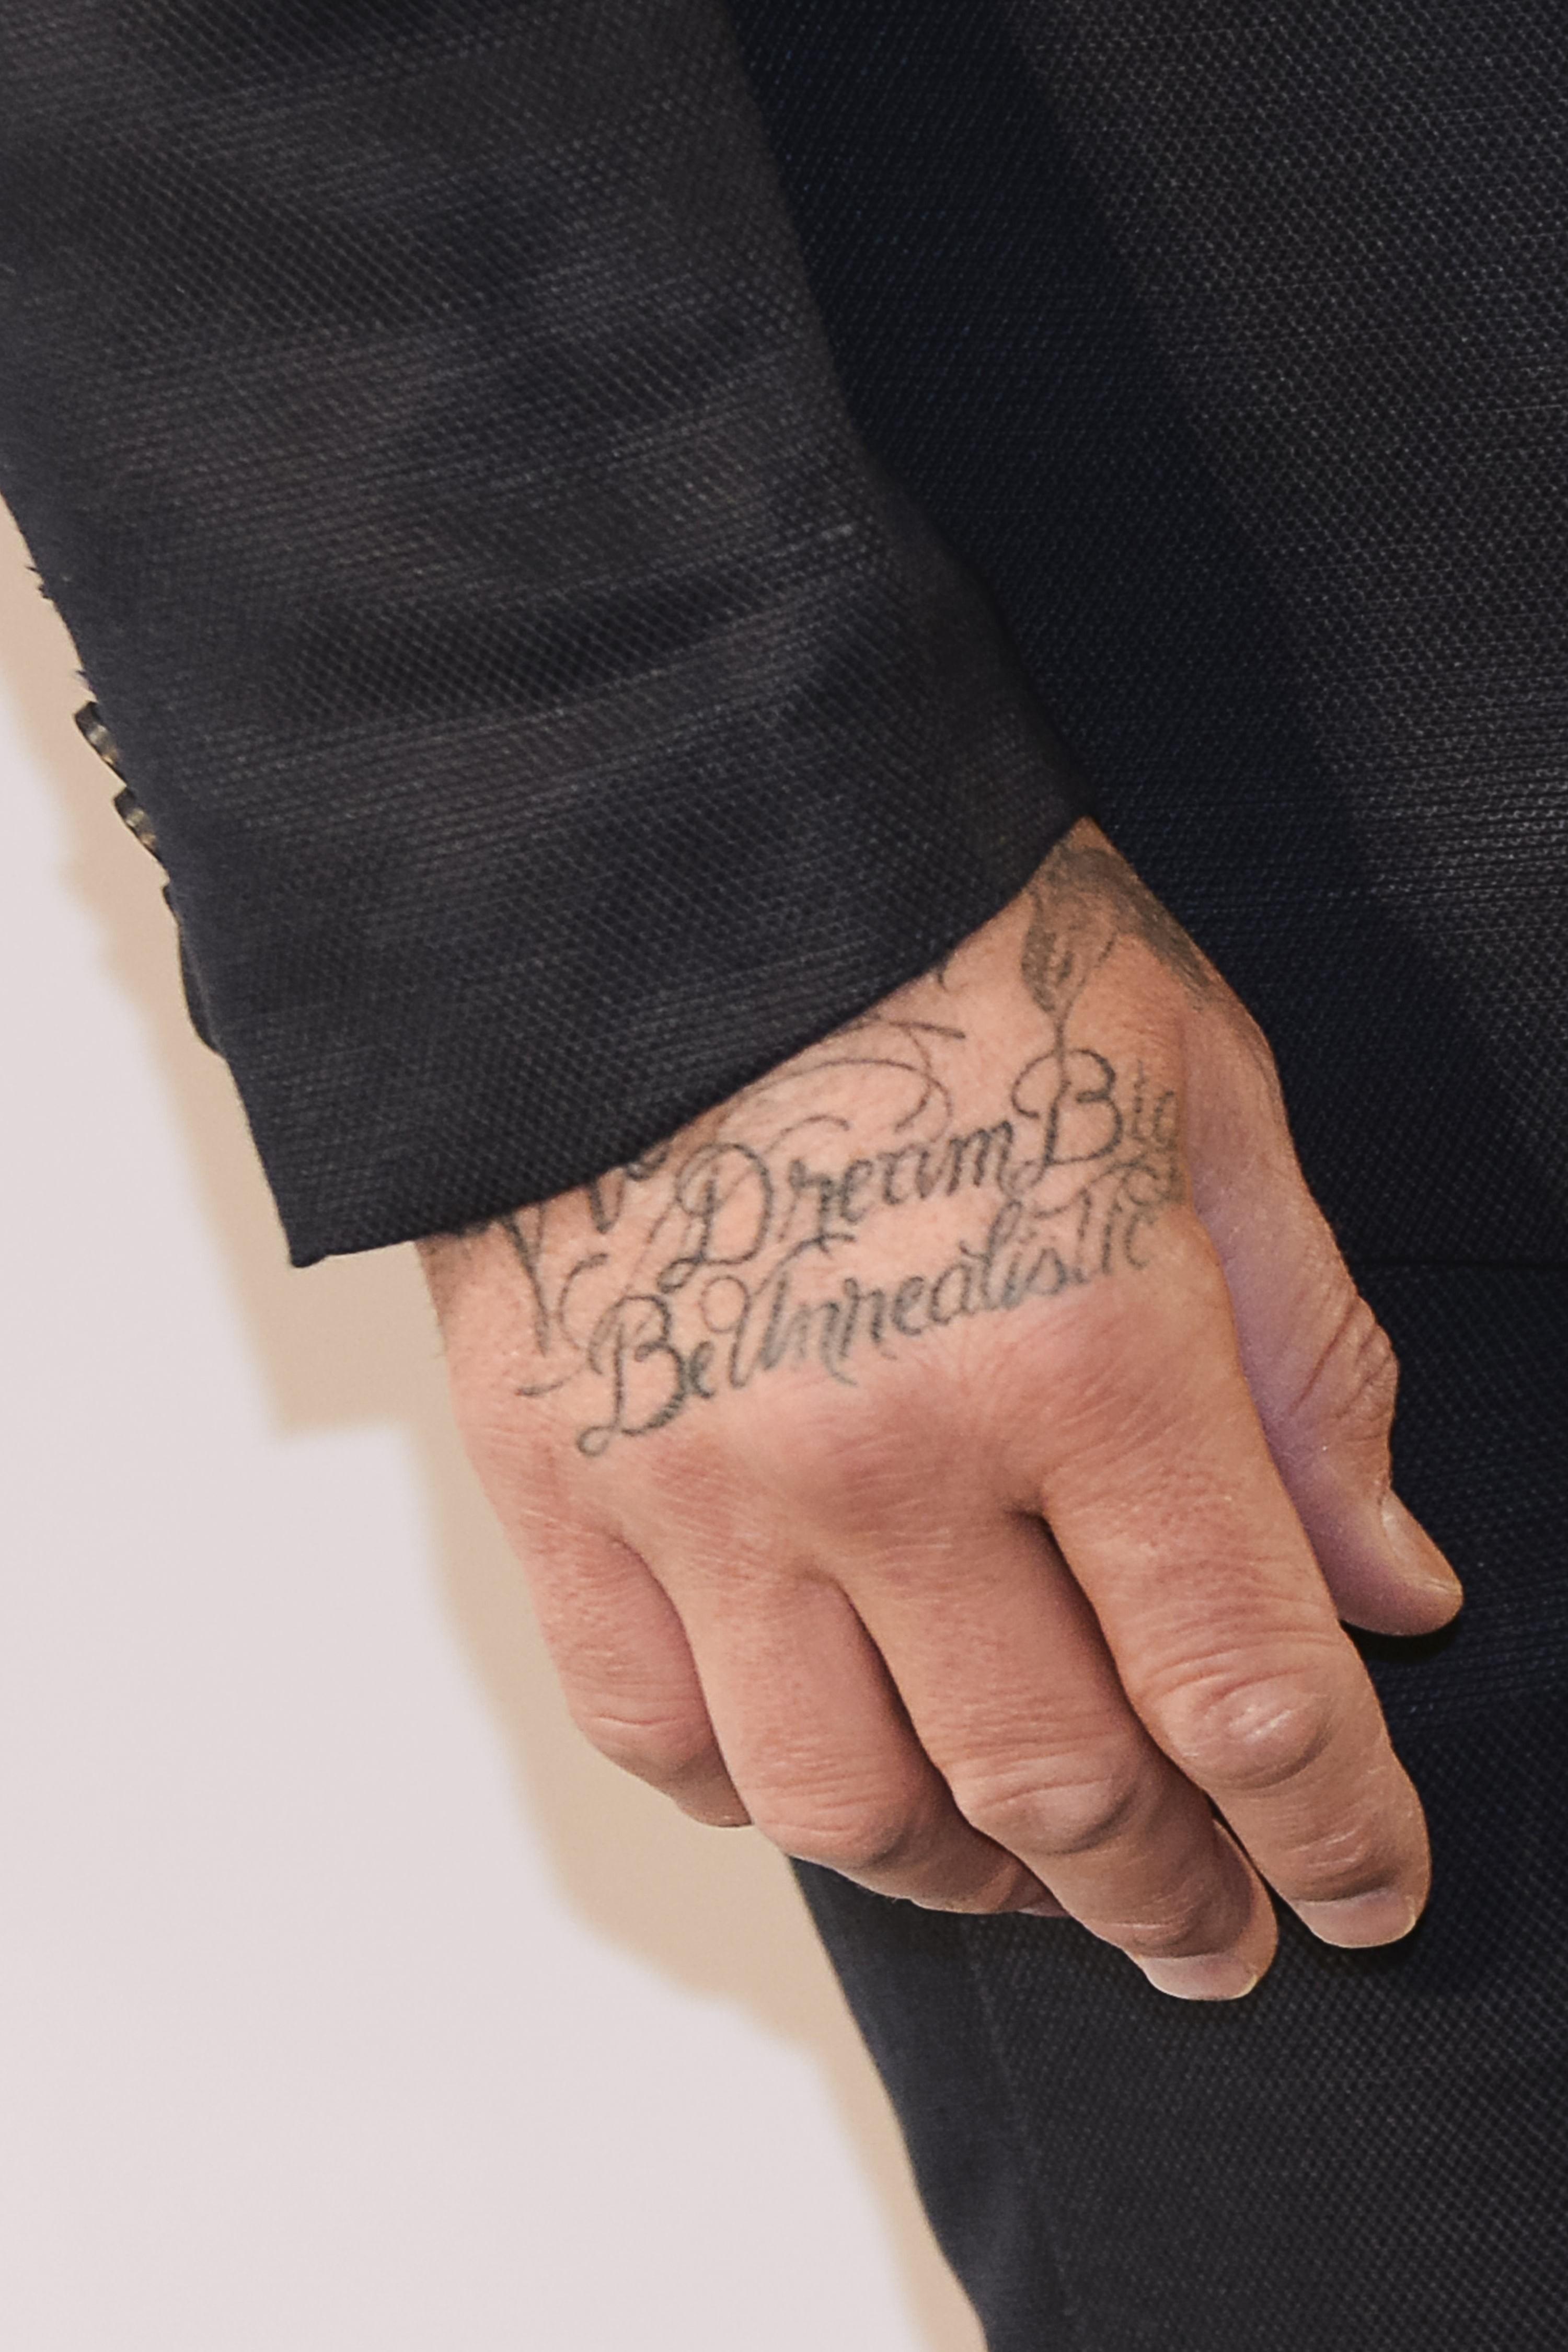 Tatuaże Davida Beckhama Co Znaczą Tatuaże Beckhama